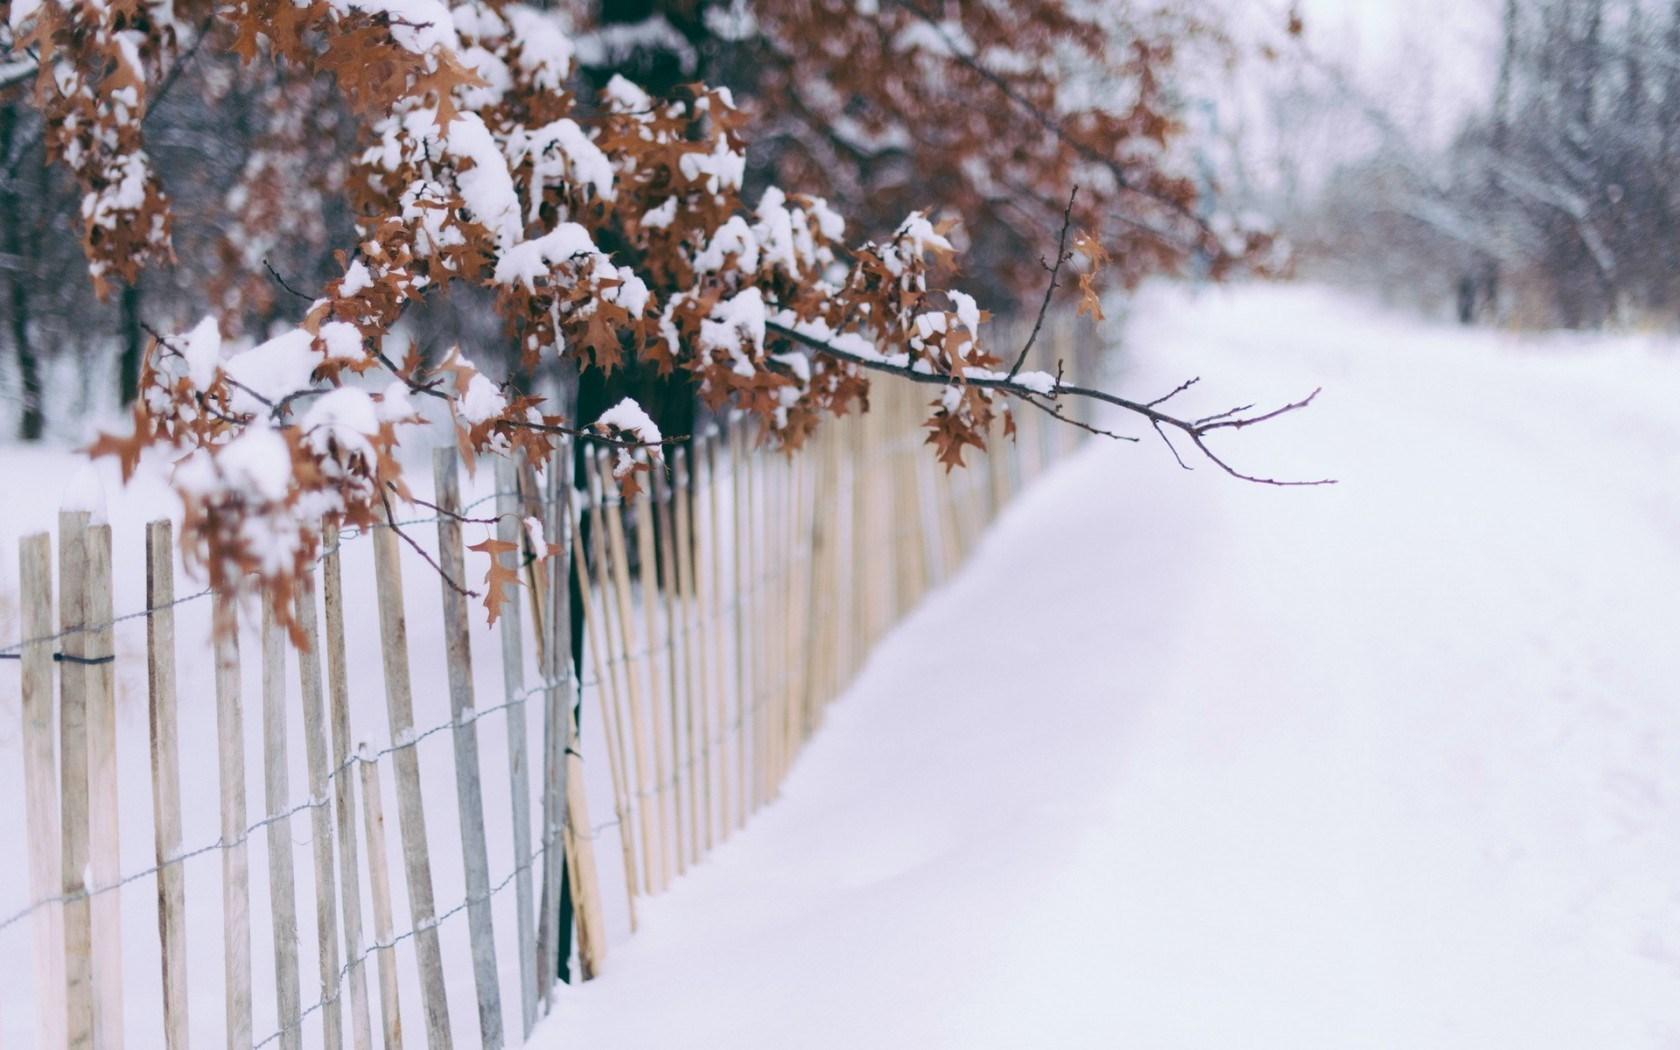 desktop backgrounds for winter